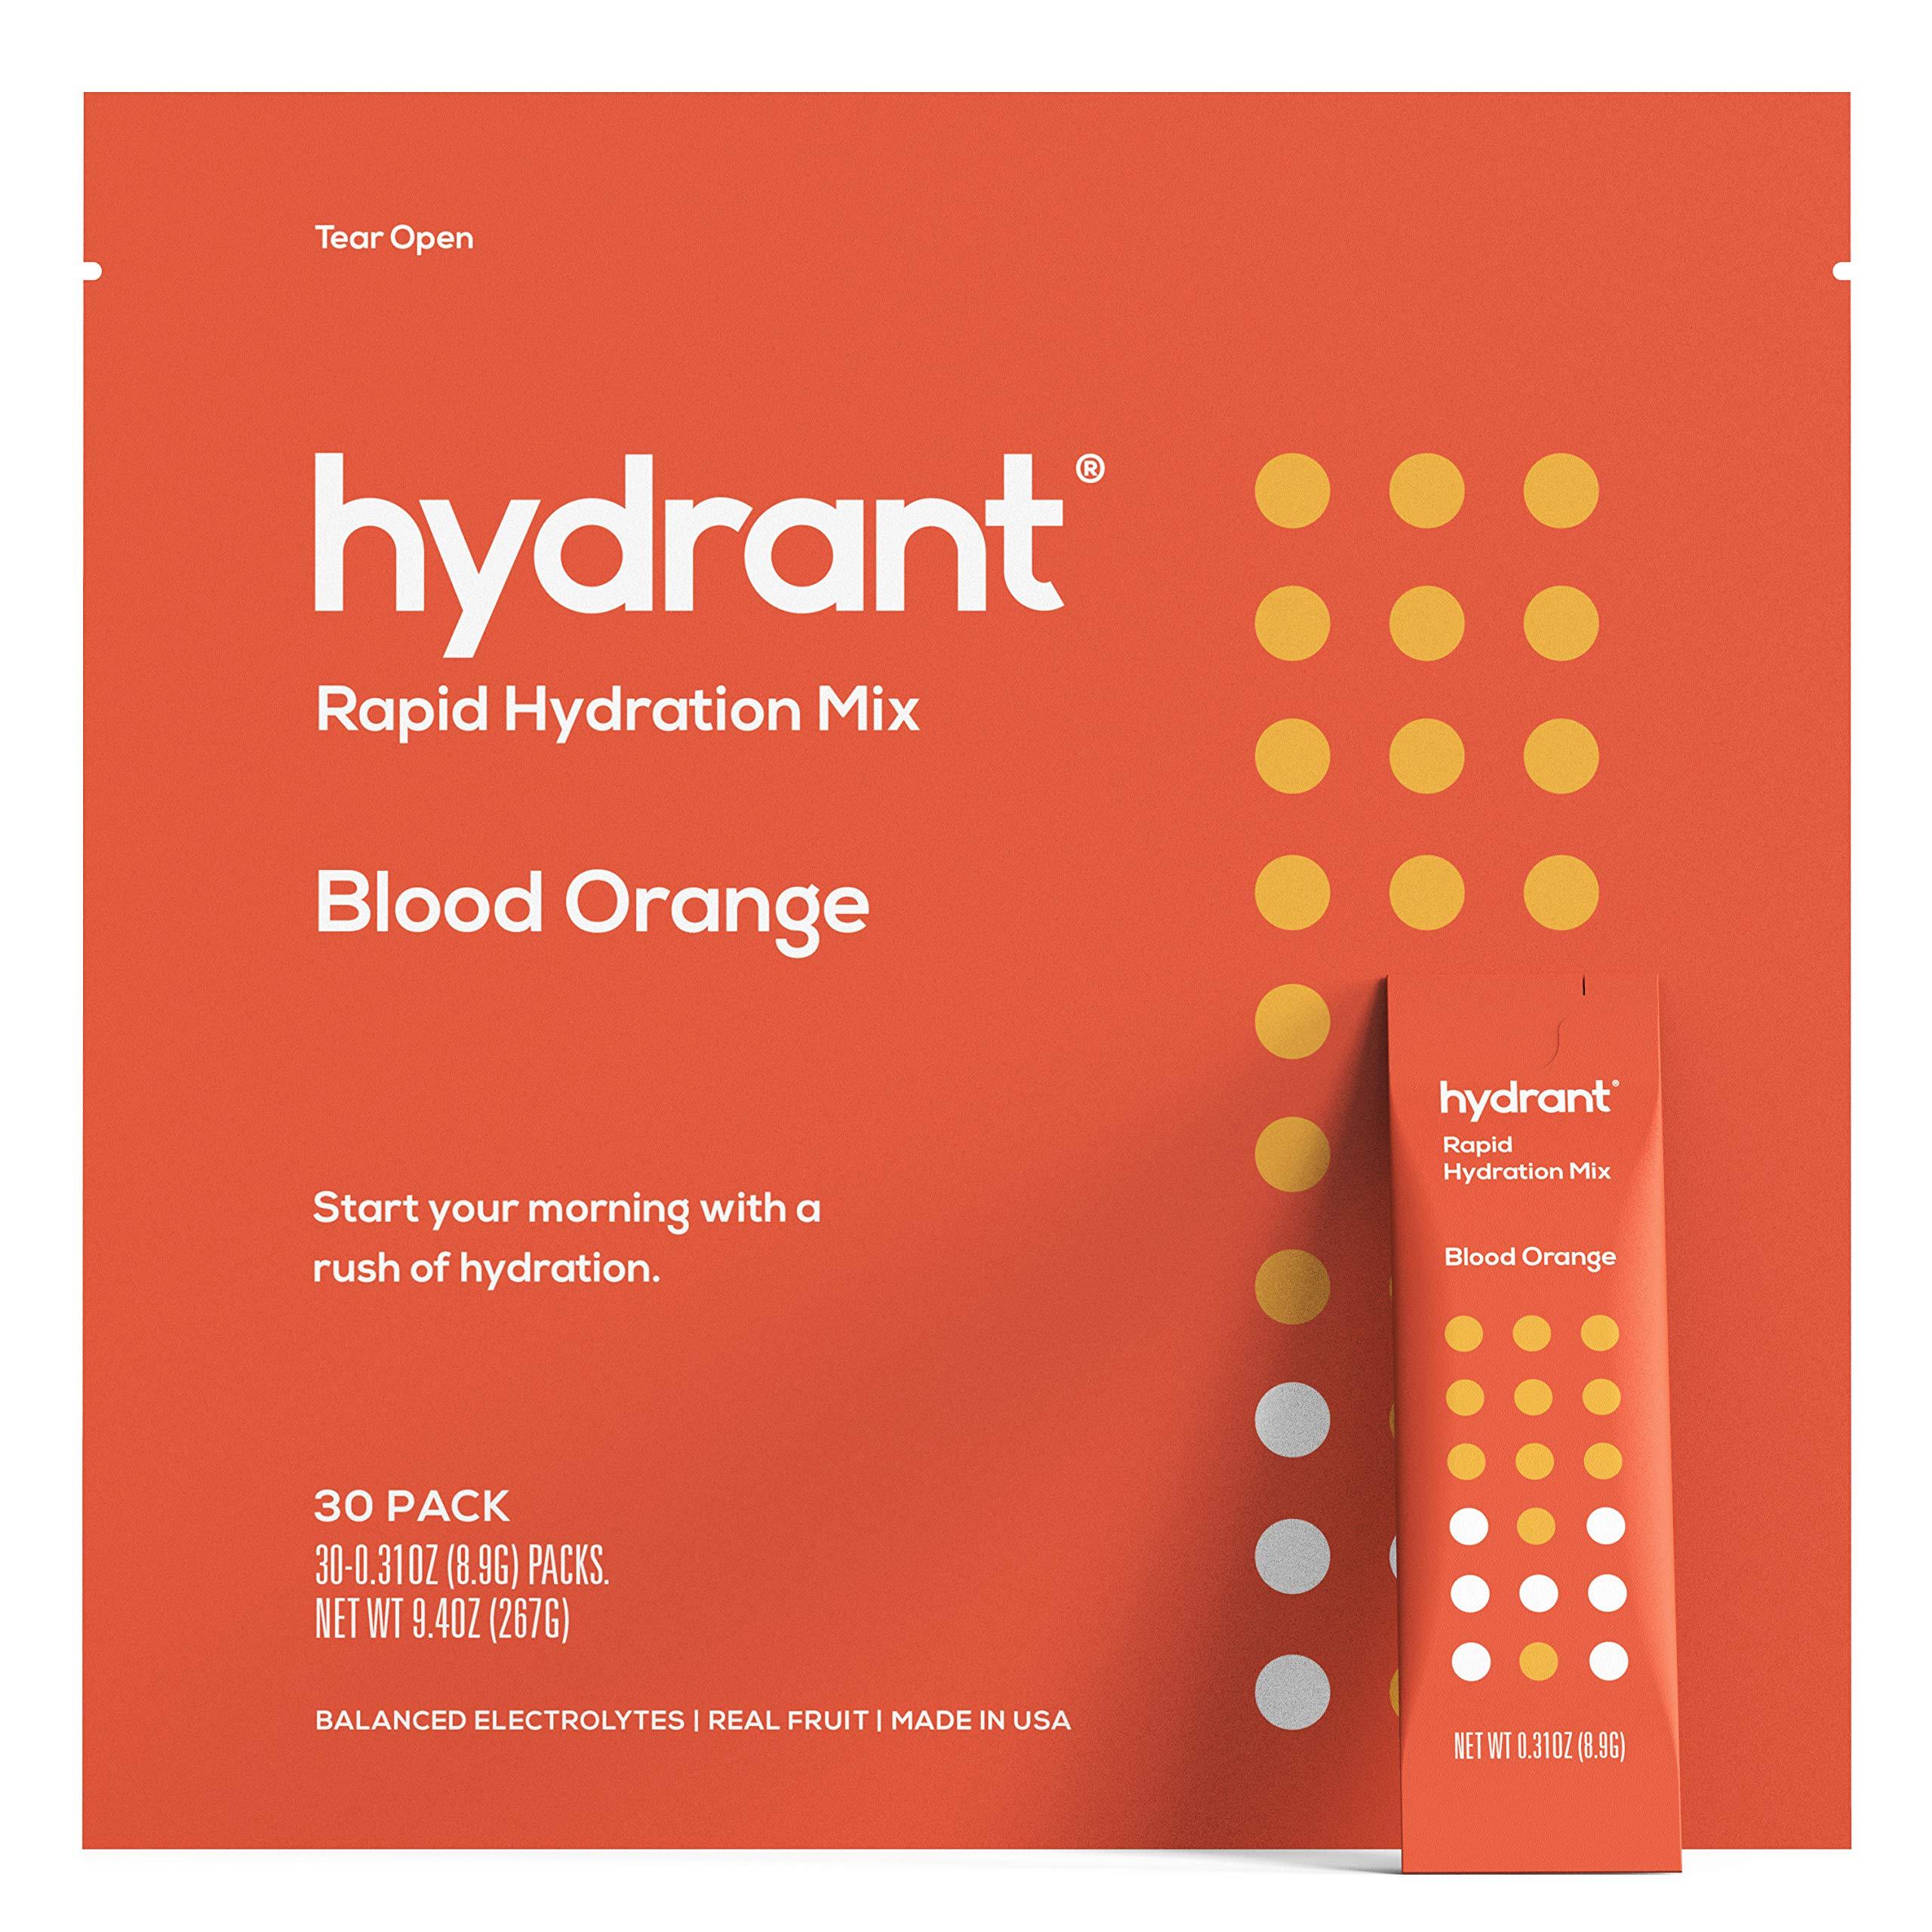 Hydrant Rapid Hydration Multiplier Version 2, Electrolyte Powder, Recovery Drink Mix, Blood Orange, 30pk